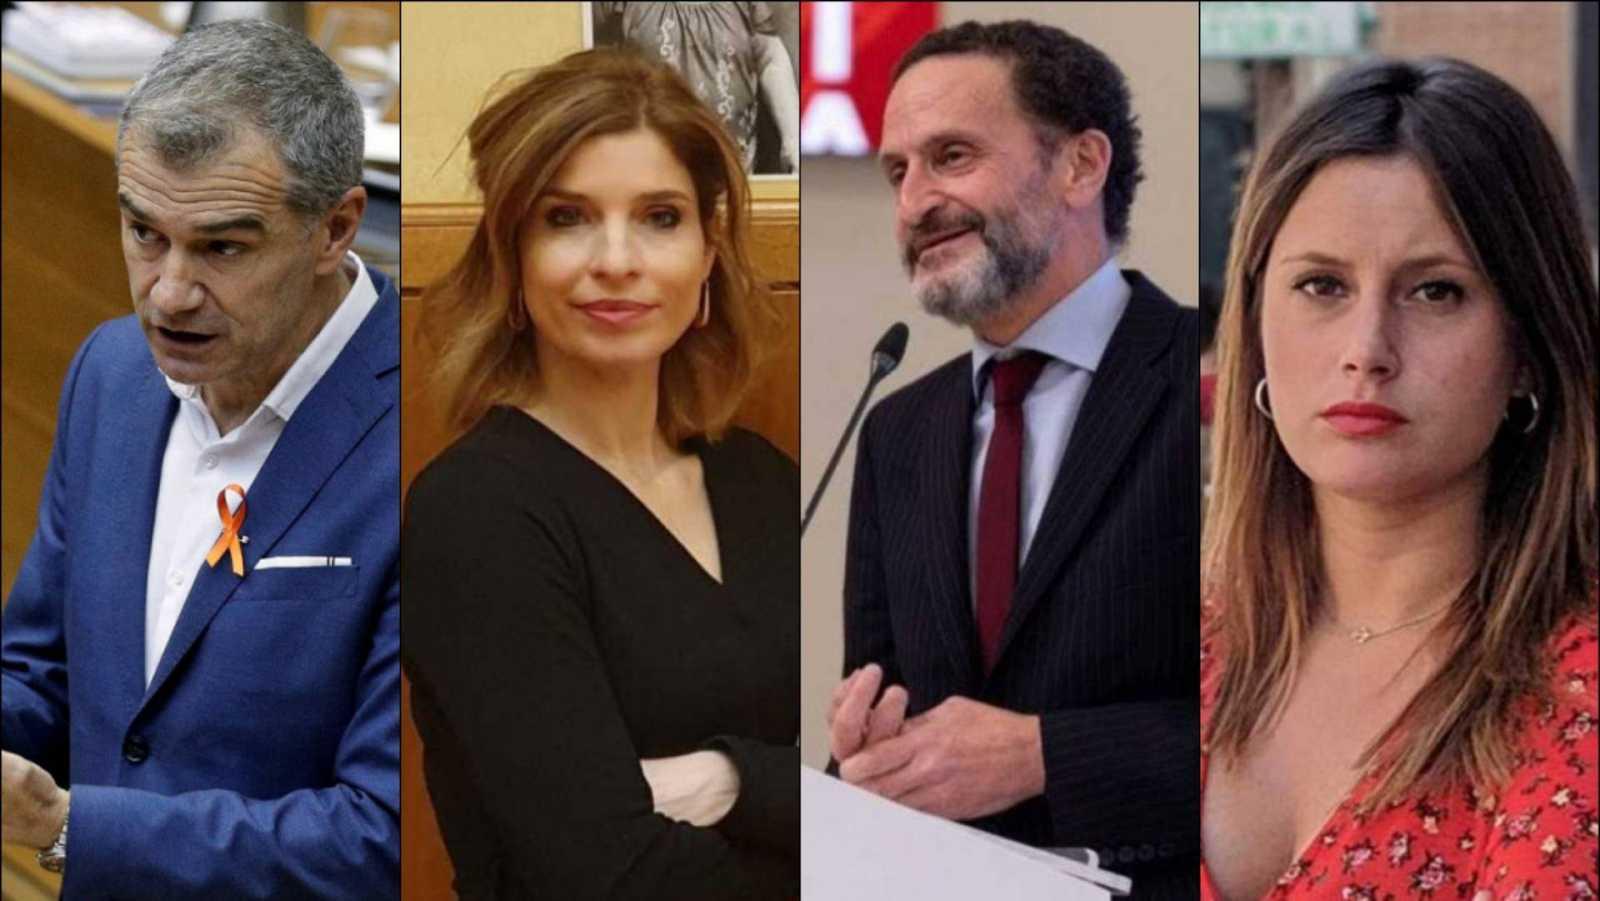 Toni Cantó (PP), Hana Jalloul (PSOE), Edmundo Bal (Cs) y Alejandra Jacinto (Podemos)